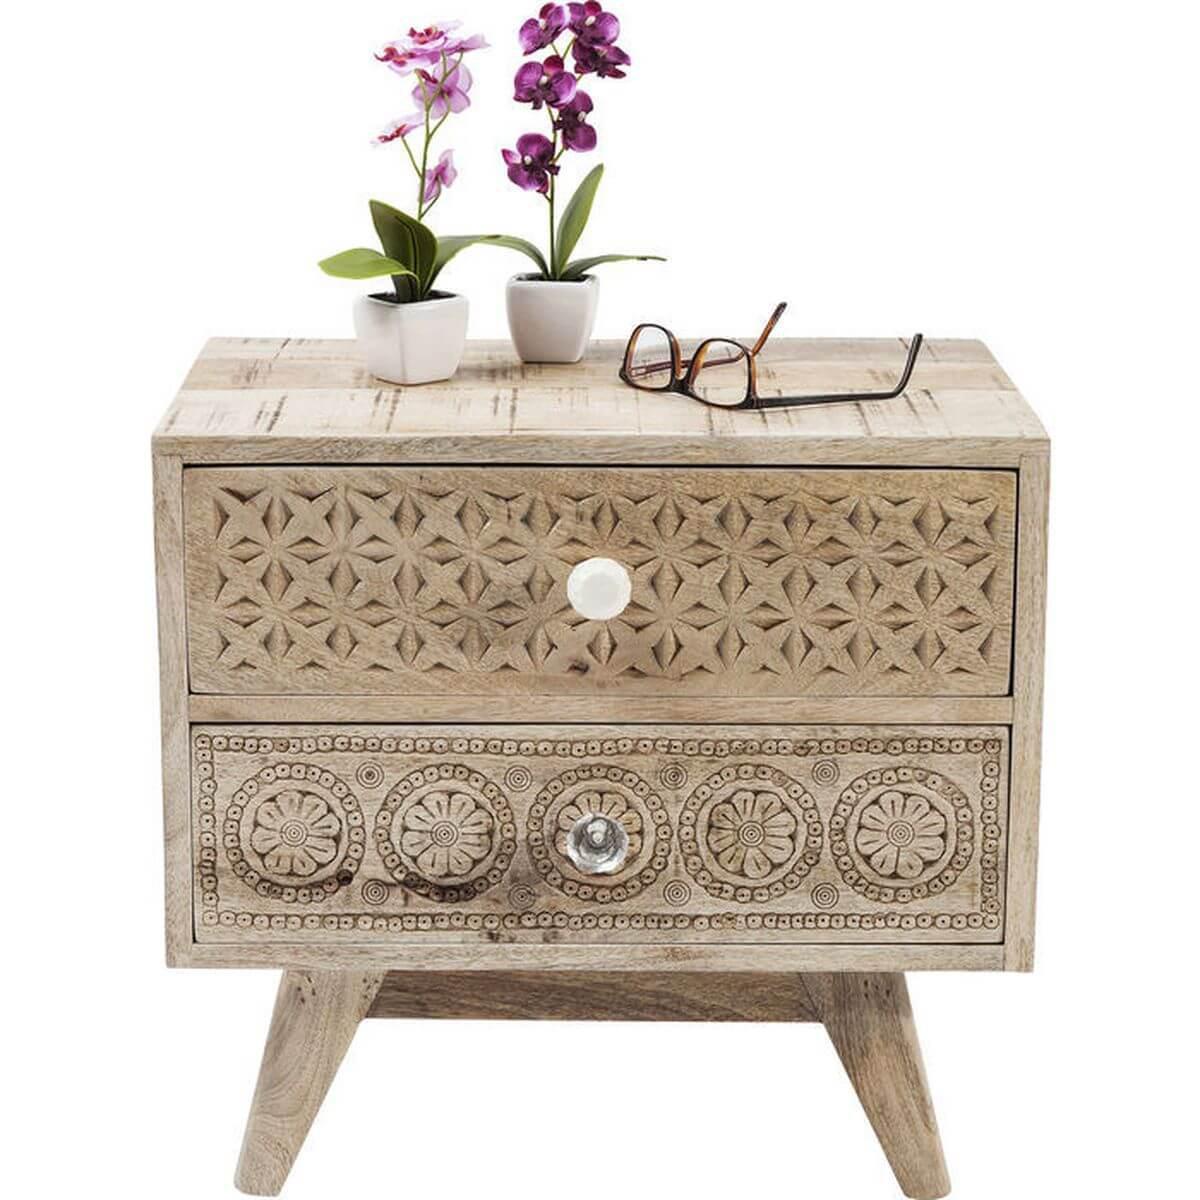 Table de chevet Puro Kare Design 50x35cm